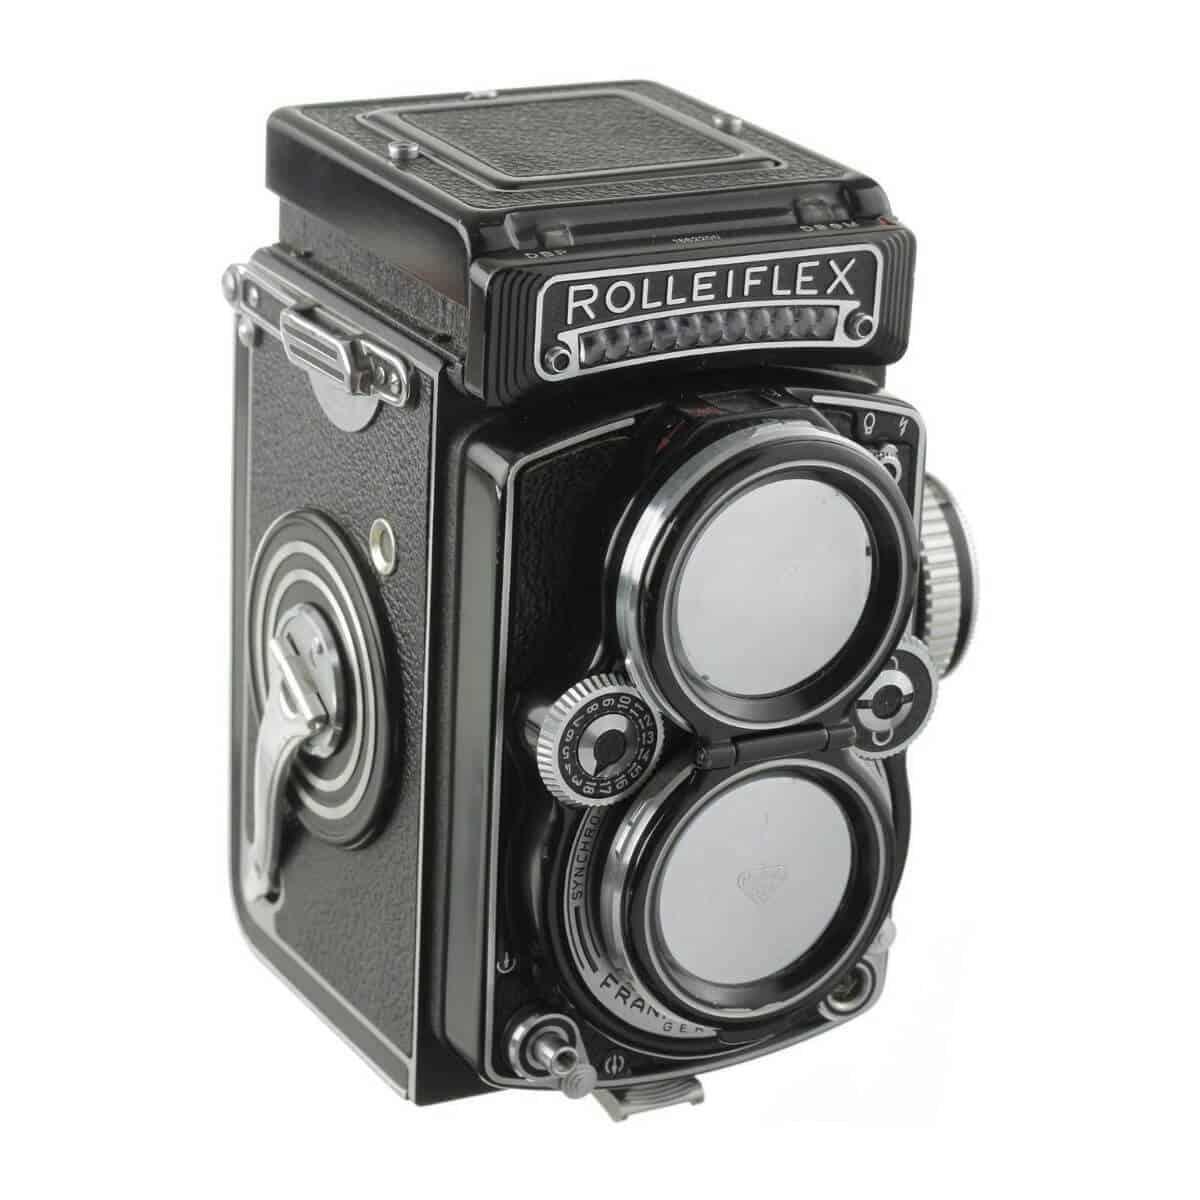 Rolleiflex 2.8 camera.